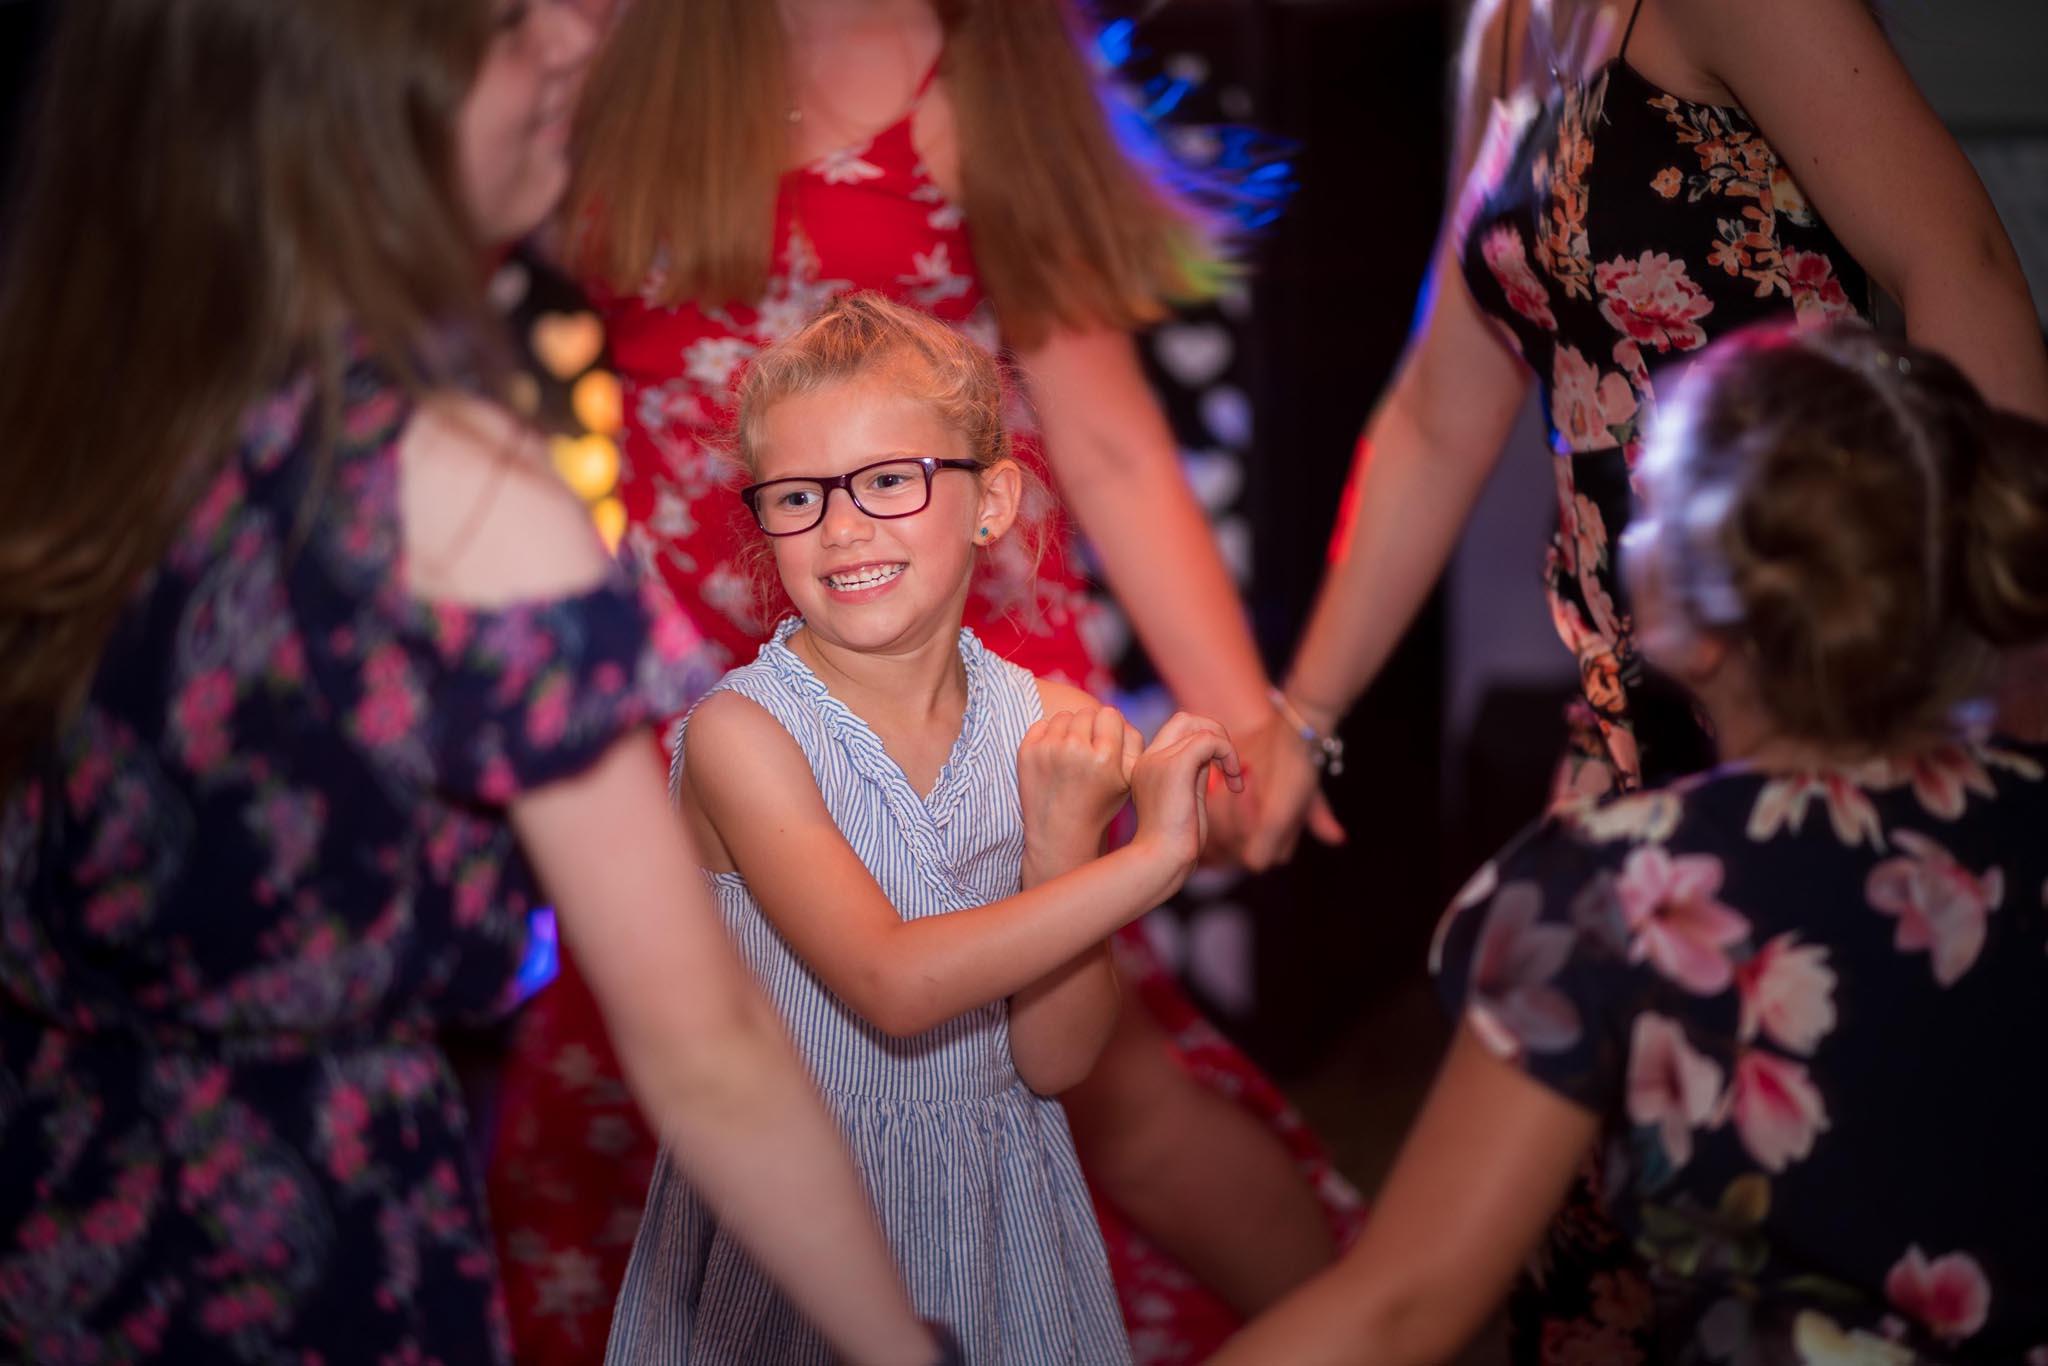 971-Night-Reception-Luke-Yasmin-The-Rayleigh-Club-Wedding-Photography.jpg